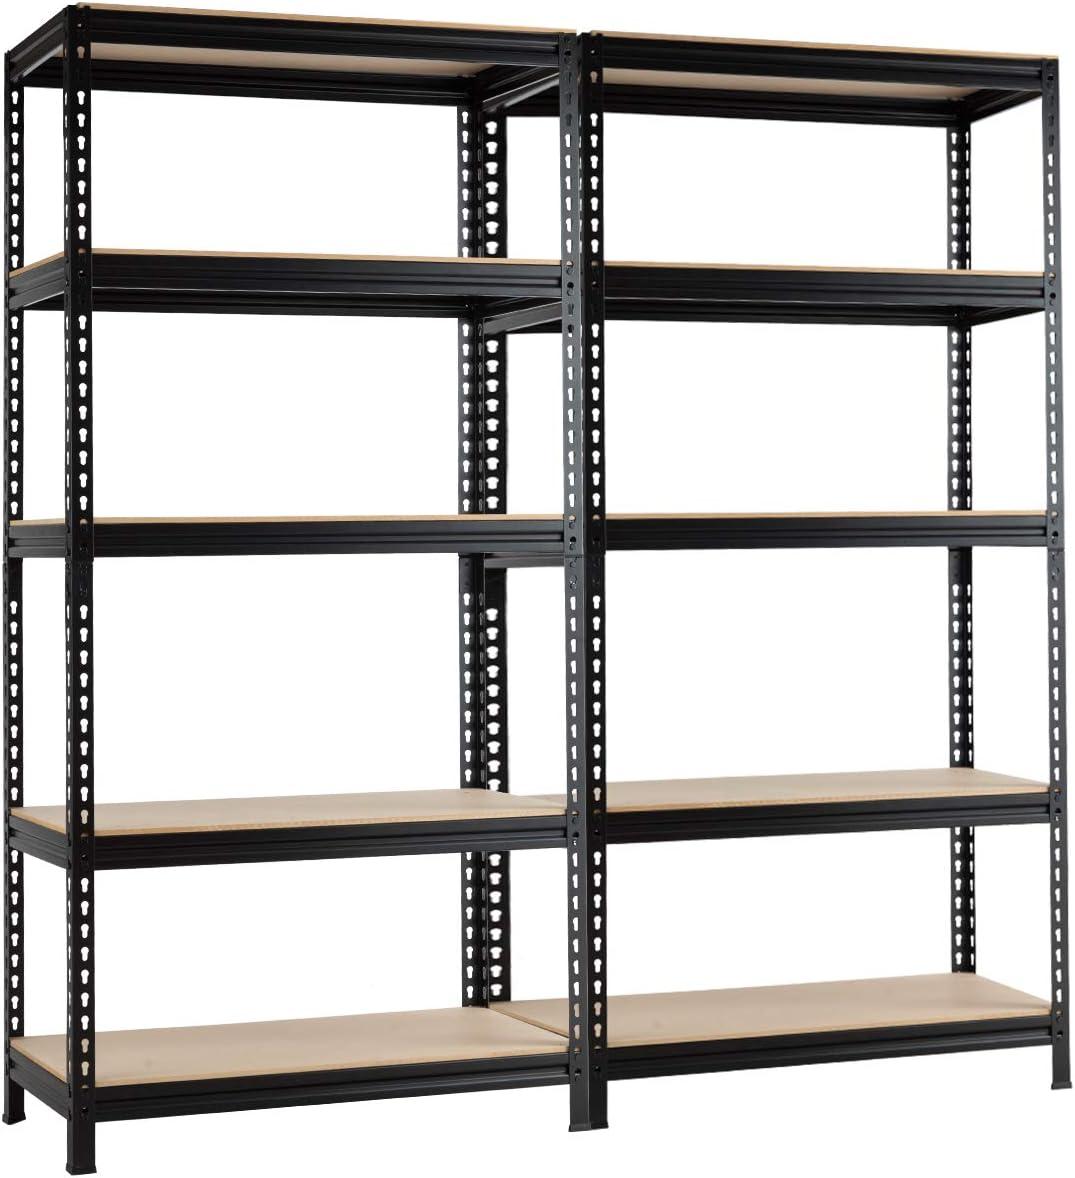 "Phoenix Mall Tangkula Austin Mall 5-Tier Steel Storage Shelves Garage She Duty Heavy 73"""